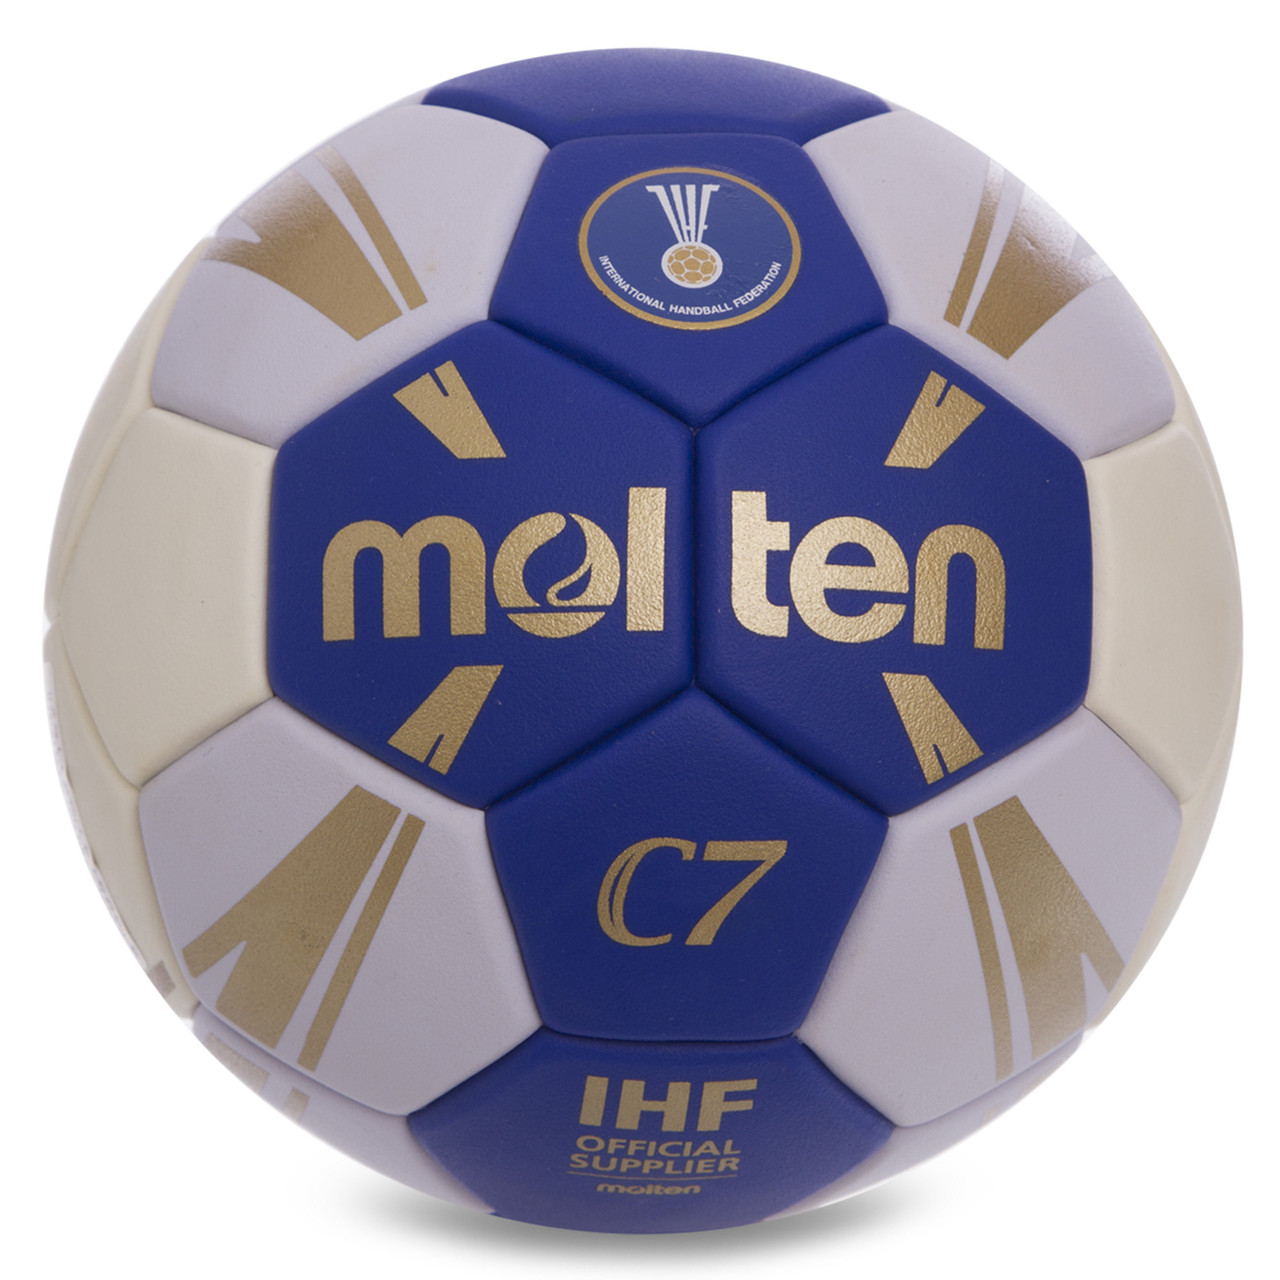 Мяч для гандбола MOLTEN H2C3500 (PVC, р-р 2, 5слоев, сшит вручную, синий)